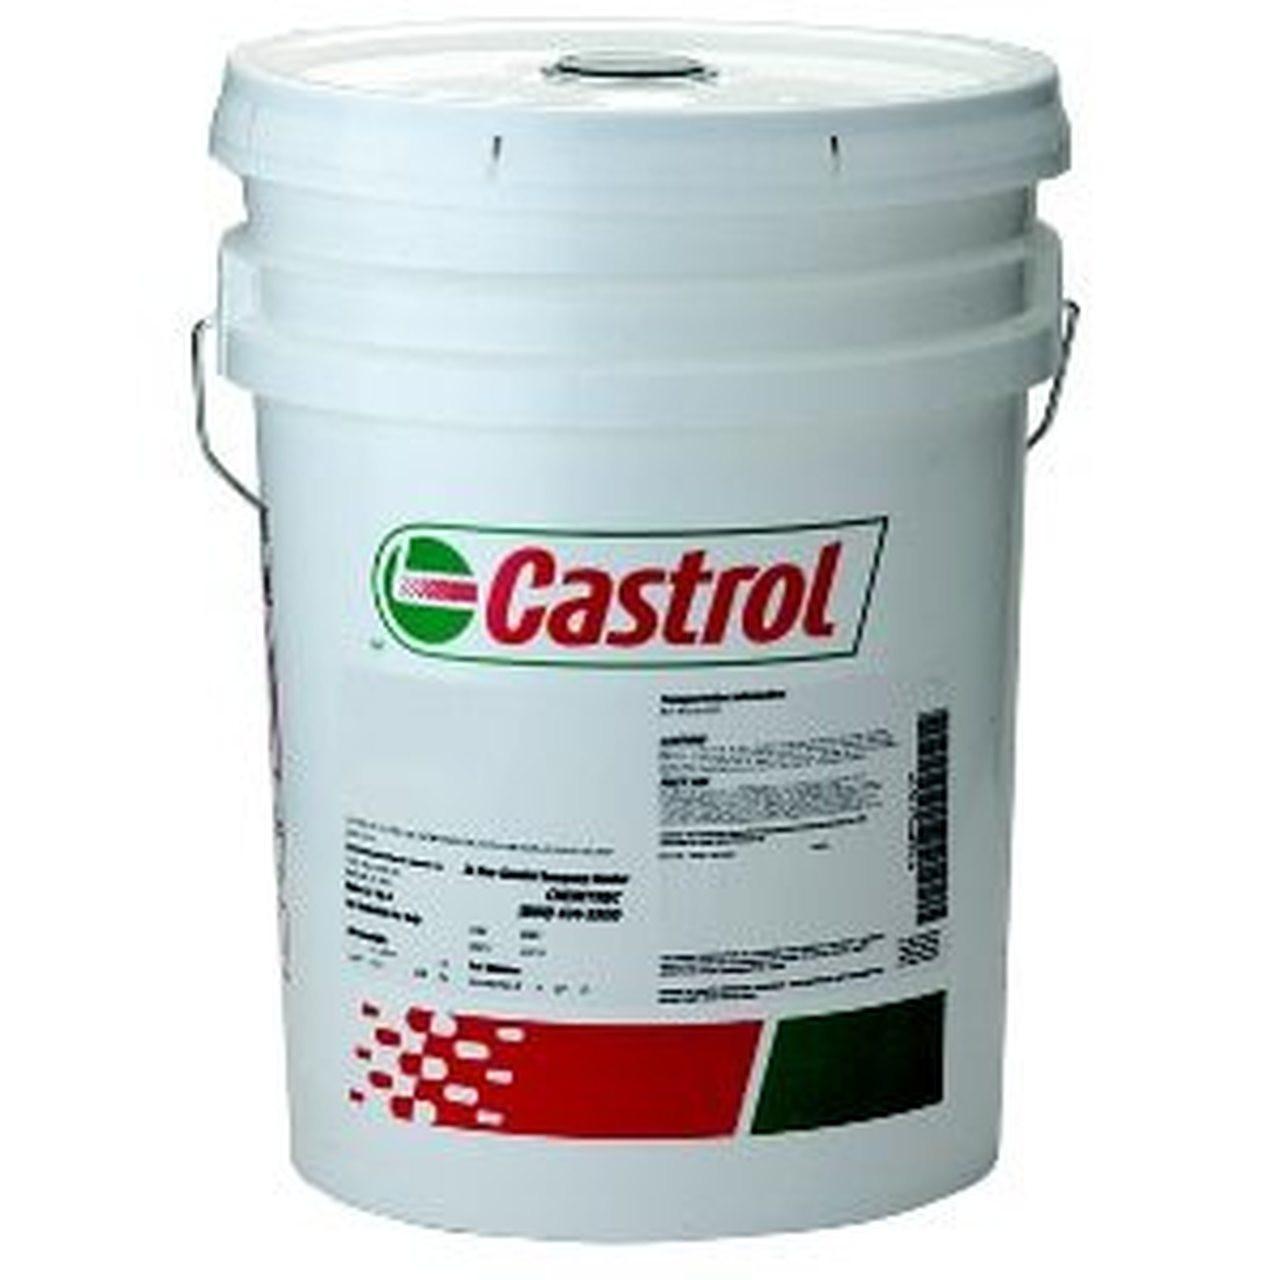 Castrol Alpha HC 32  - 5 Gallon Pail (previously Castrol Isolube)